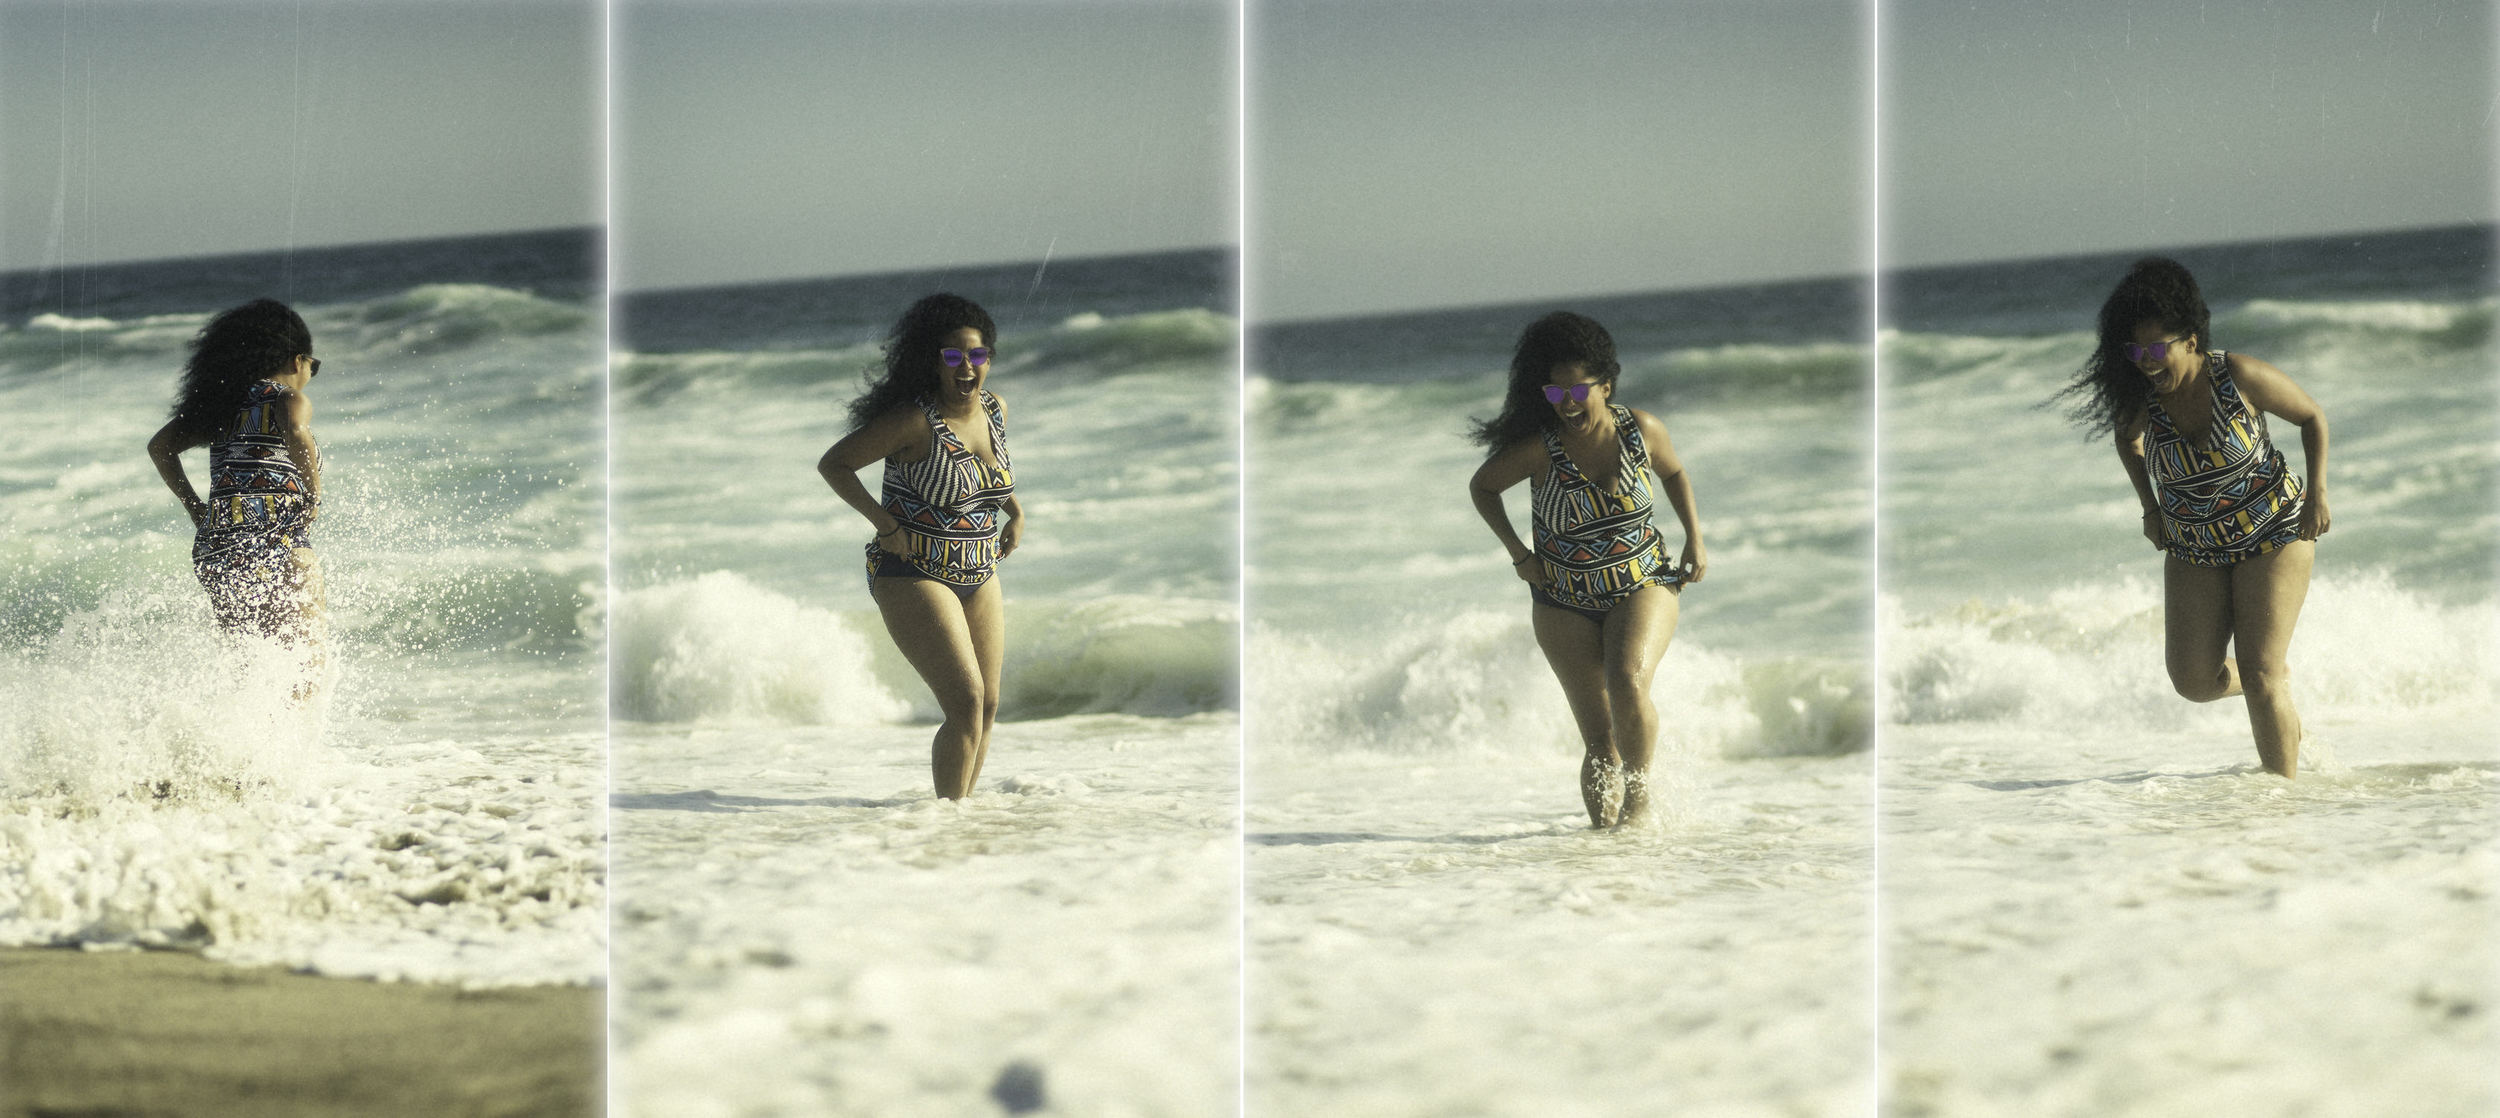 Ehsan-Mahdizadeh-Jihan-Curvy-Girl-Editorial-Portrait-lifestyle-photography-vancouver-beach-la-los-agles-1.jpg